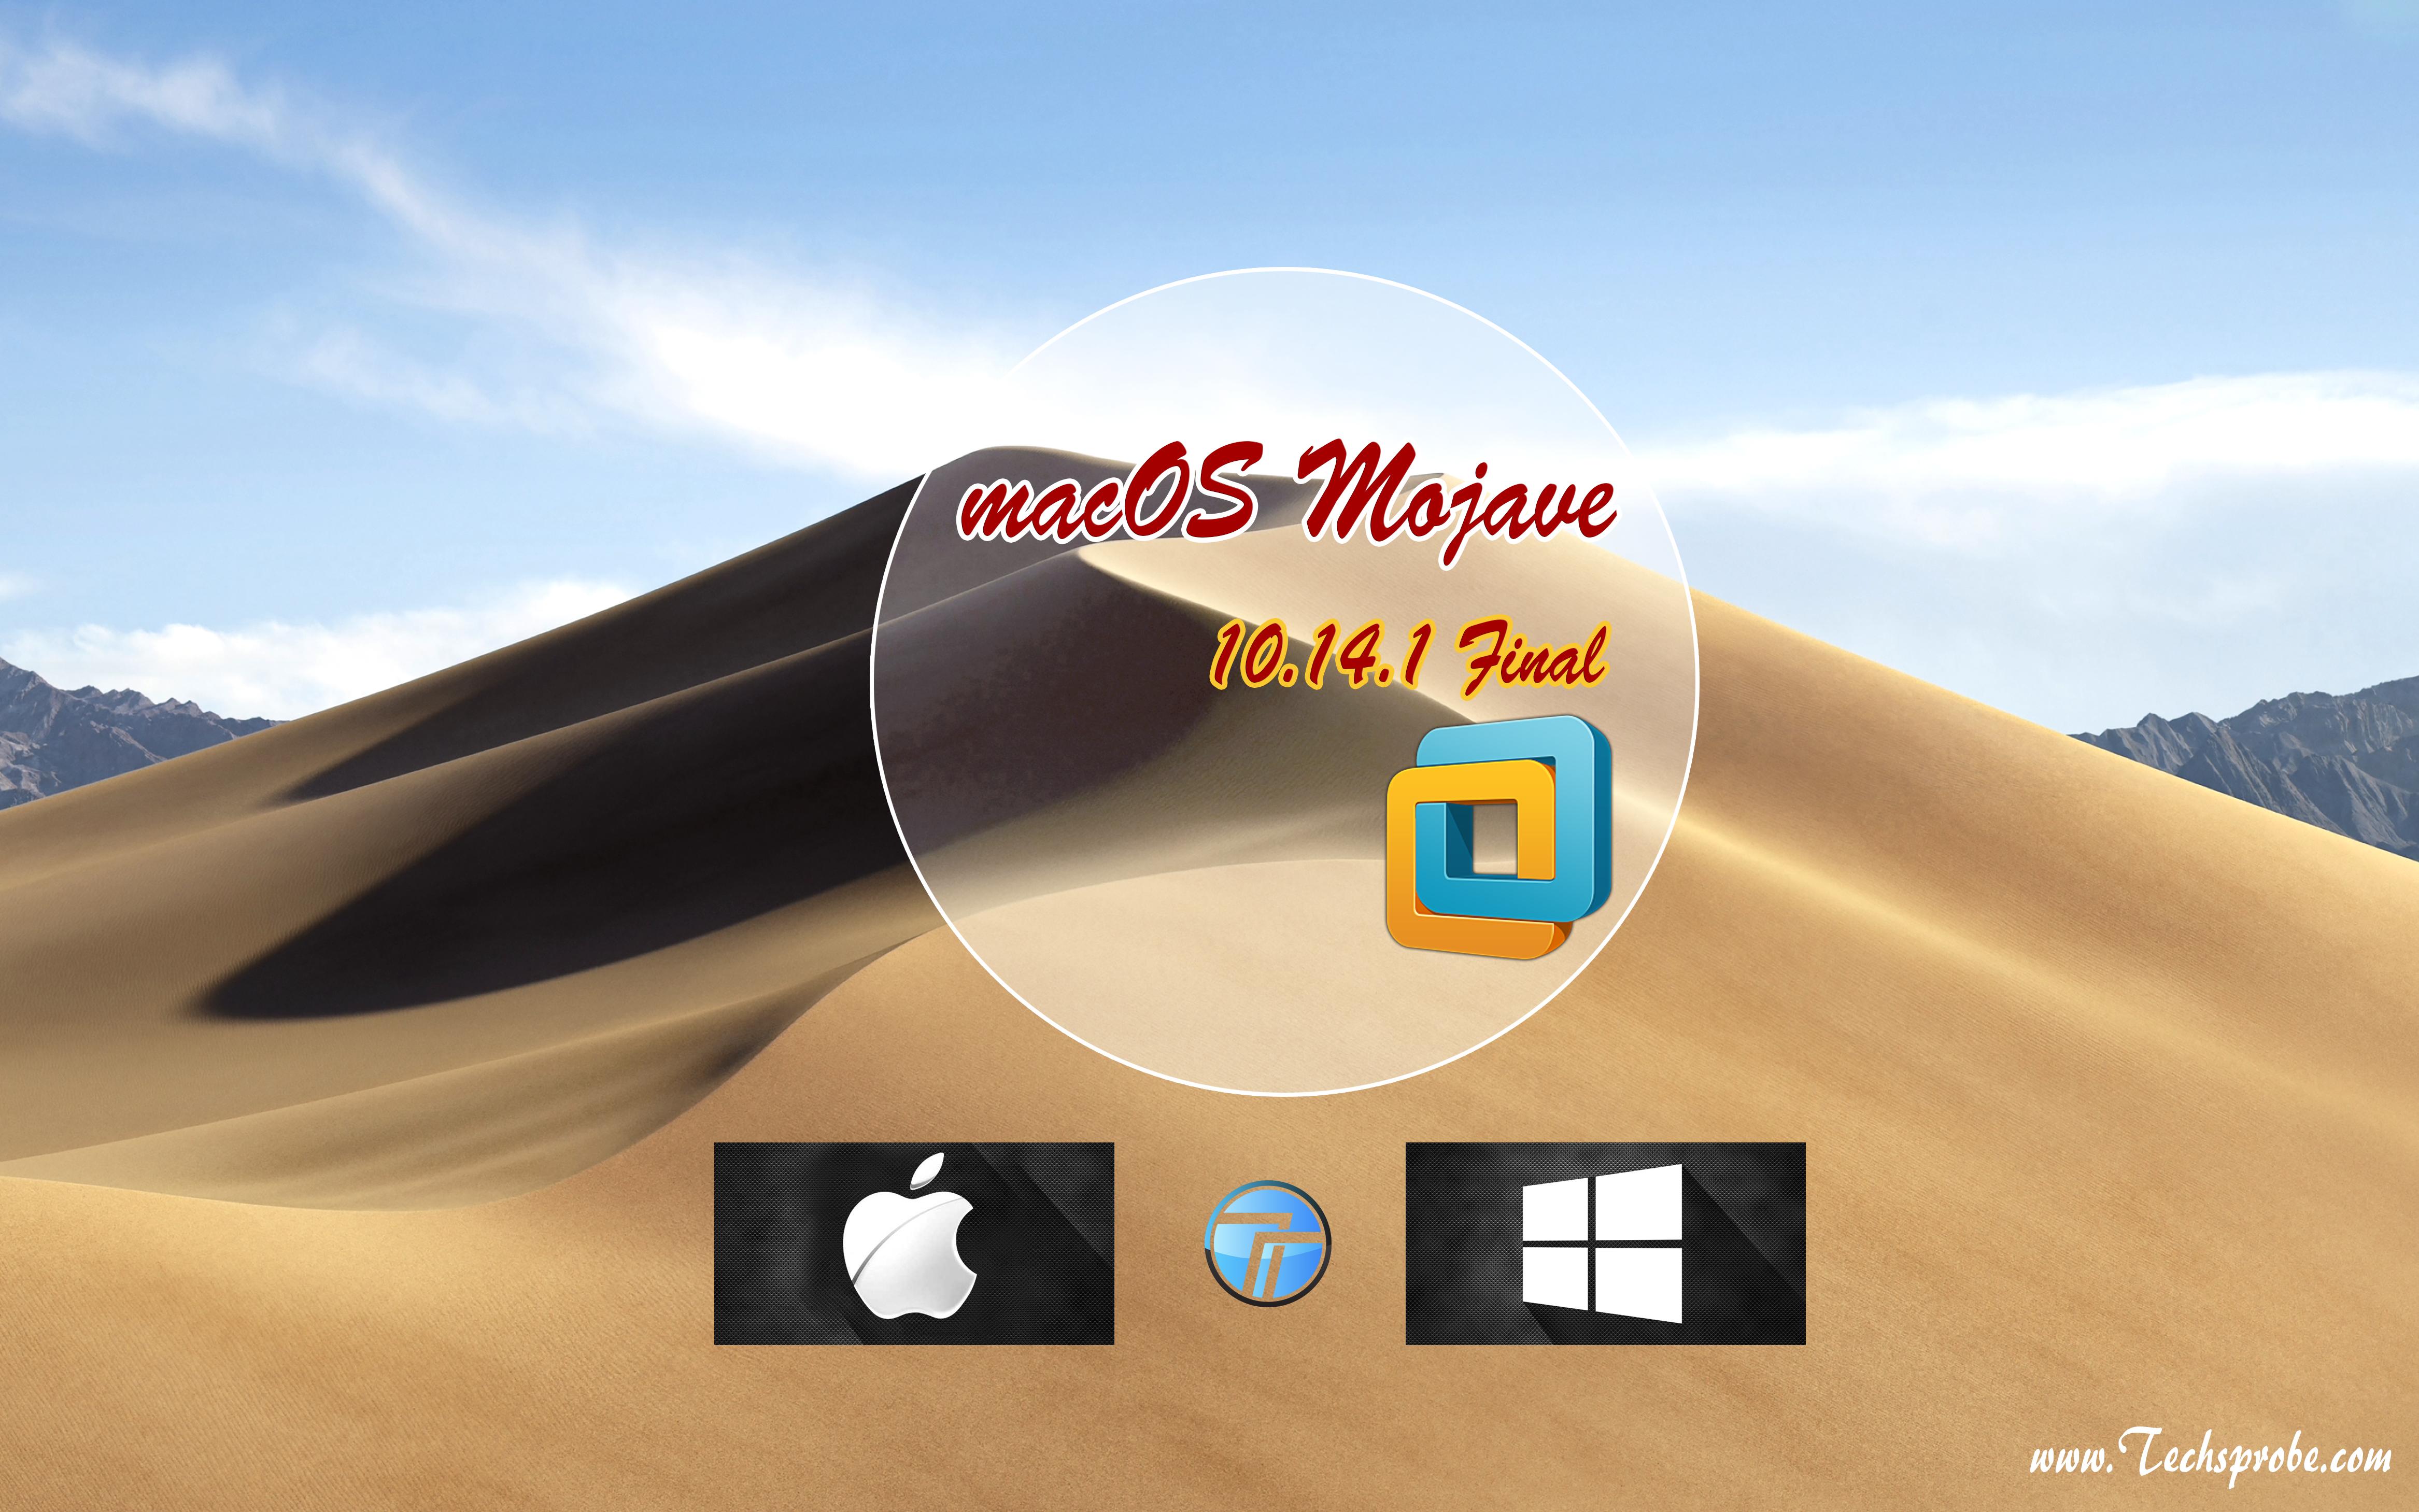 install macOS Mojave 10.14.1 on VMware